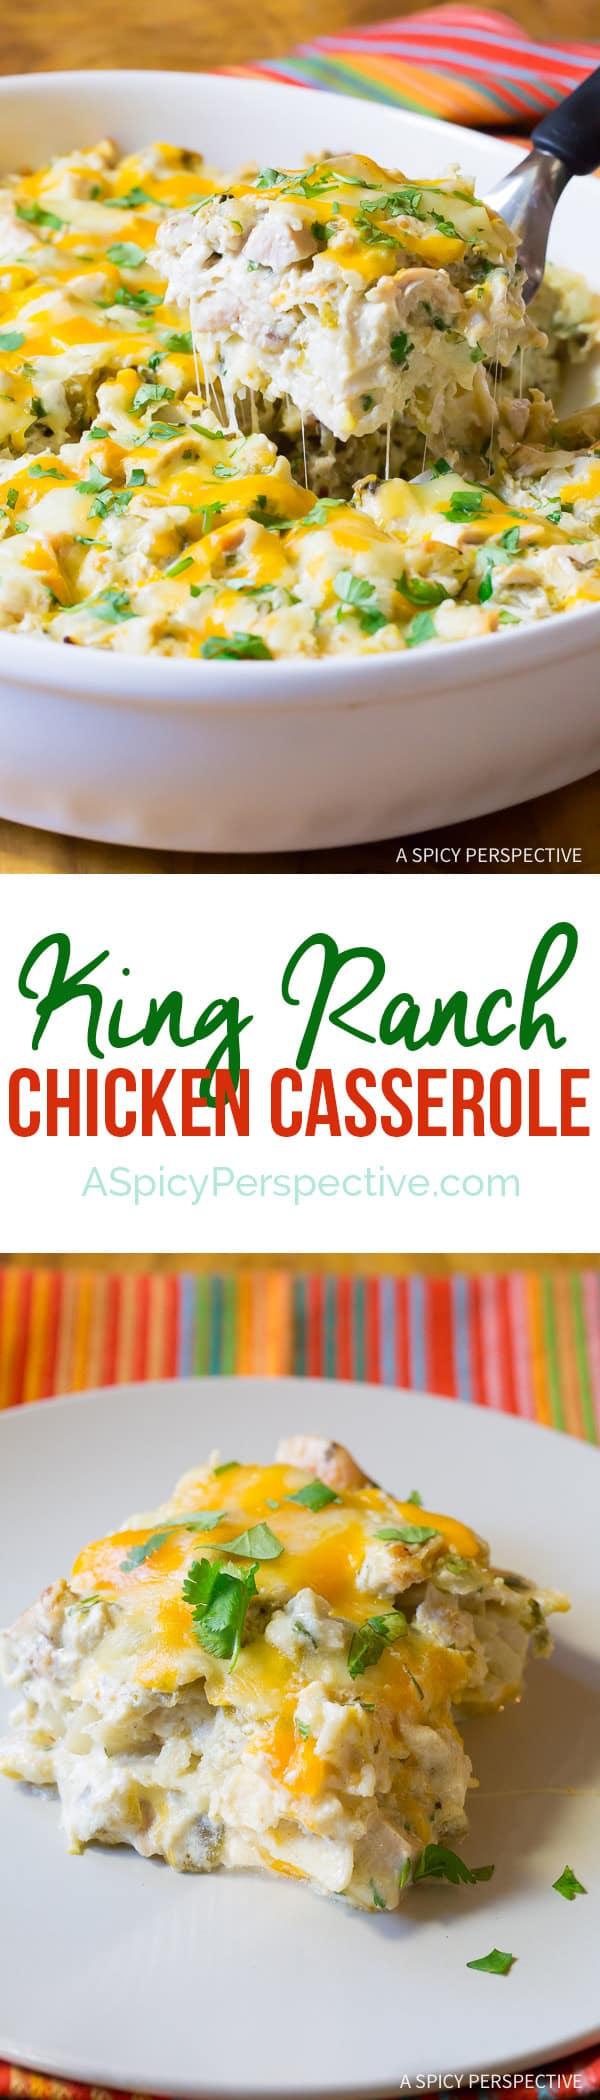 Cheesy Zesty King Ranch Chicken Casserole Recipe | ASpicyPerspective.com